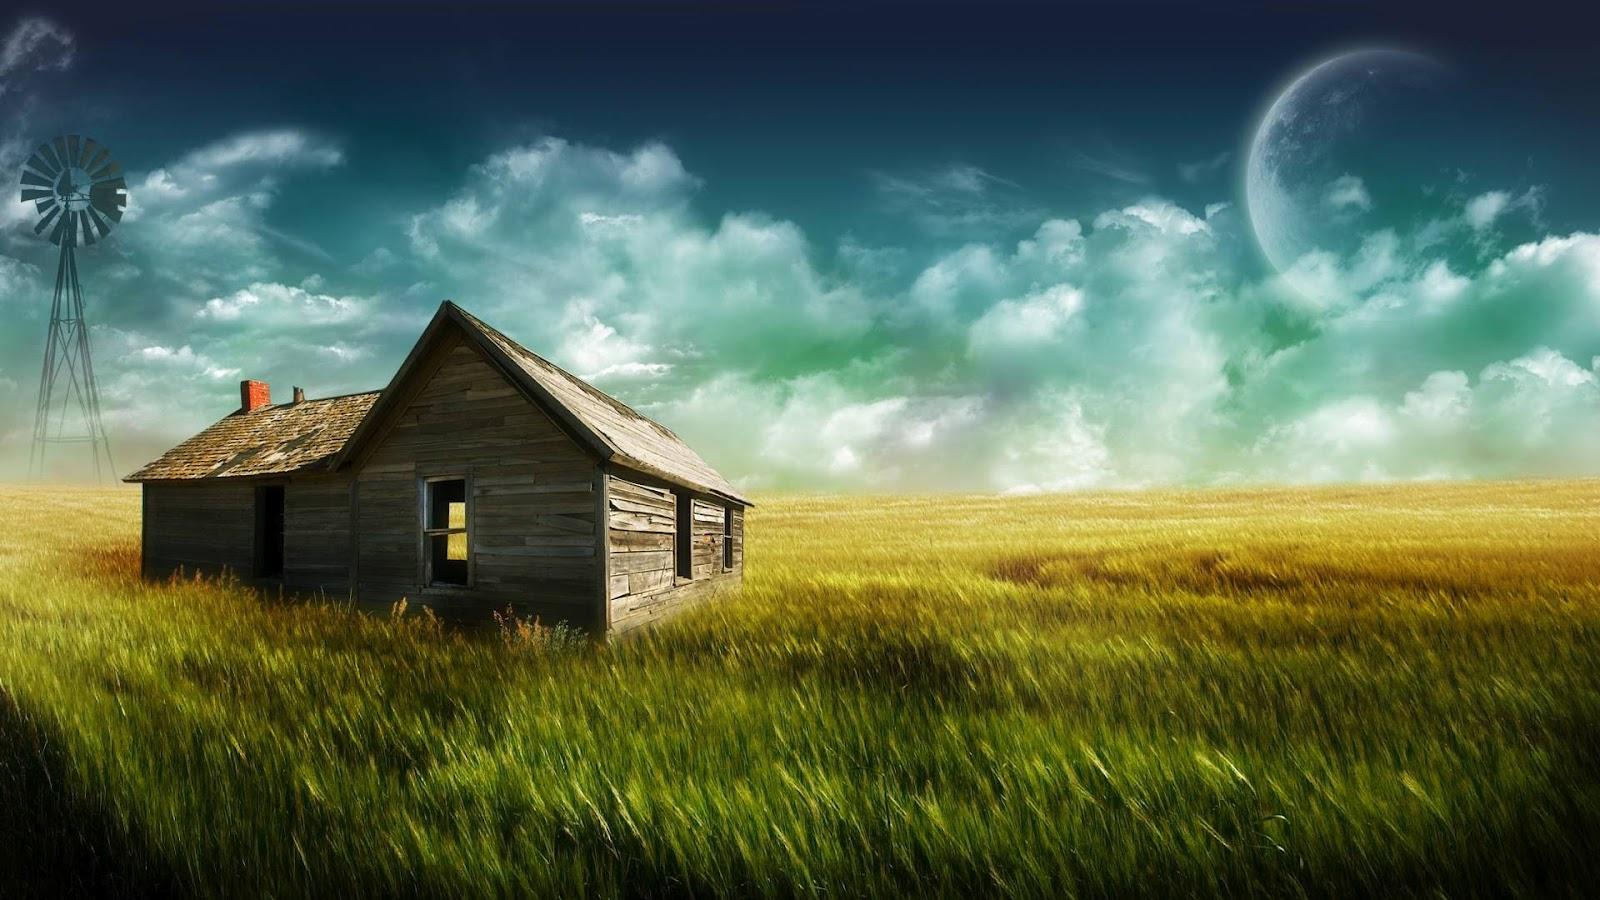 http://3.bp.blogspot.com/-7xVm2WVbQ8s/UEhiNUEPy3I/AAAAAAAABB4/Zk7Olj0sx0o/s1600/national-geographic-full-HD-nature-background-wallpaper-for-laptop-wid